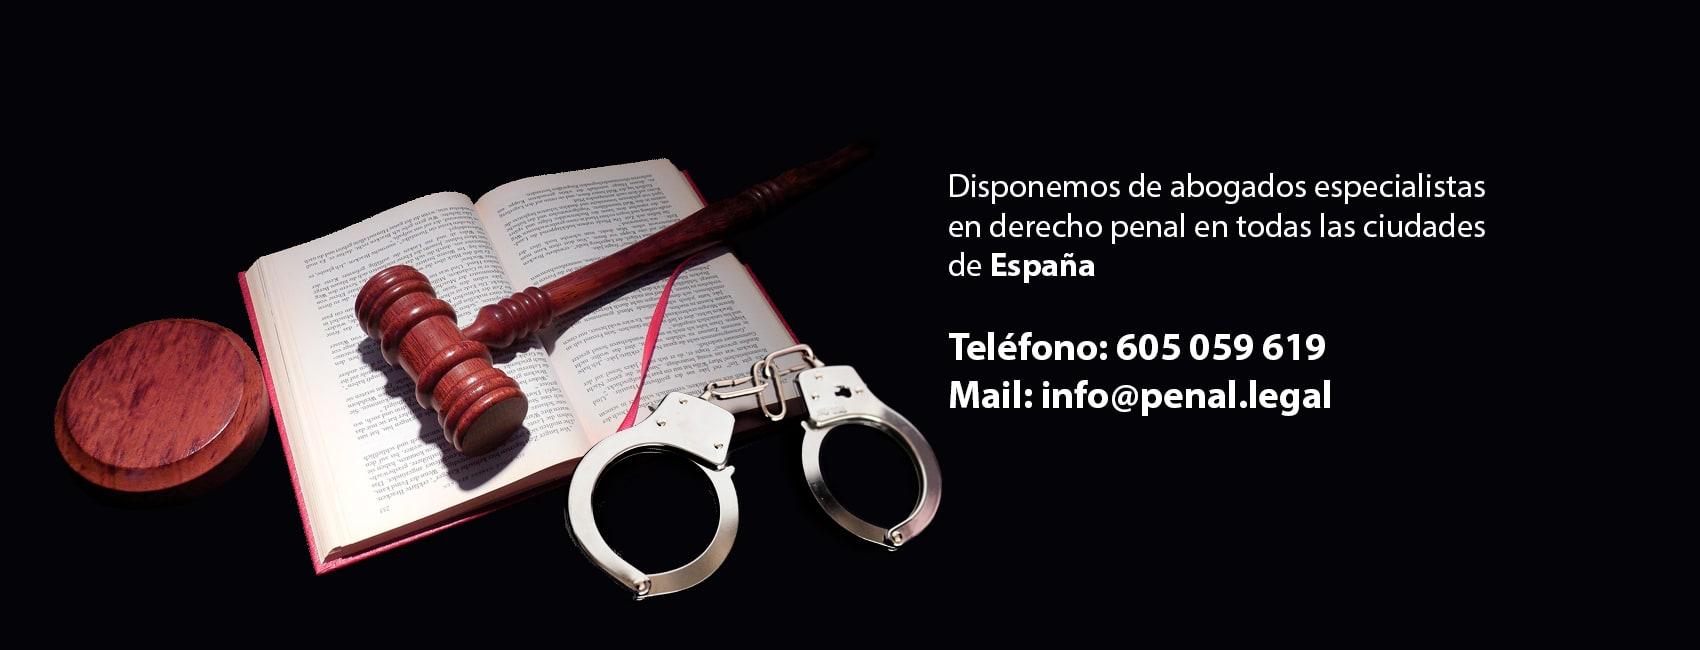 abogados especialistas en derecho penal